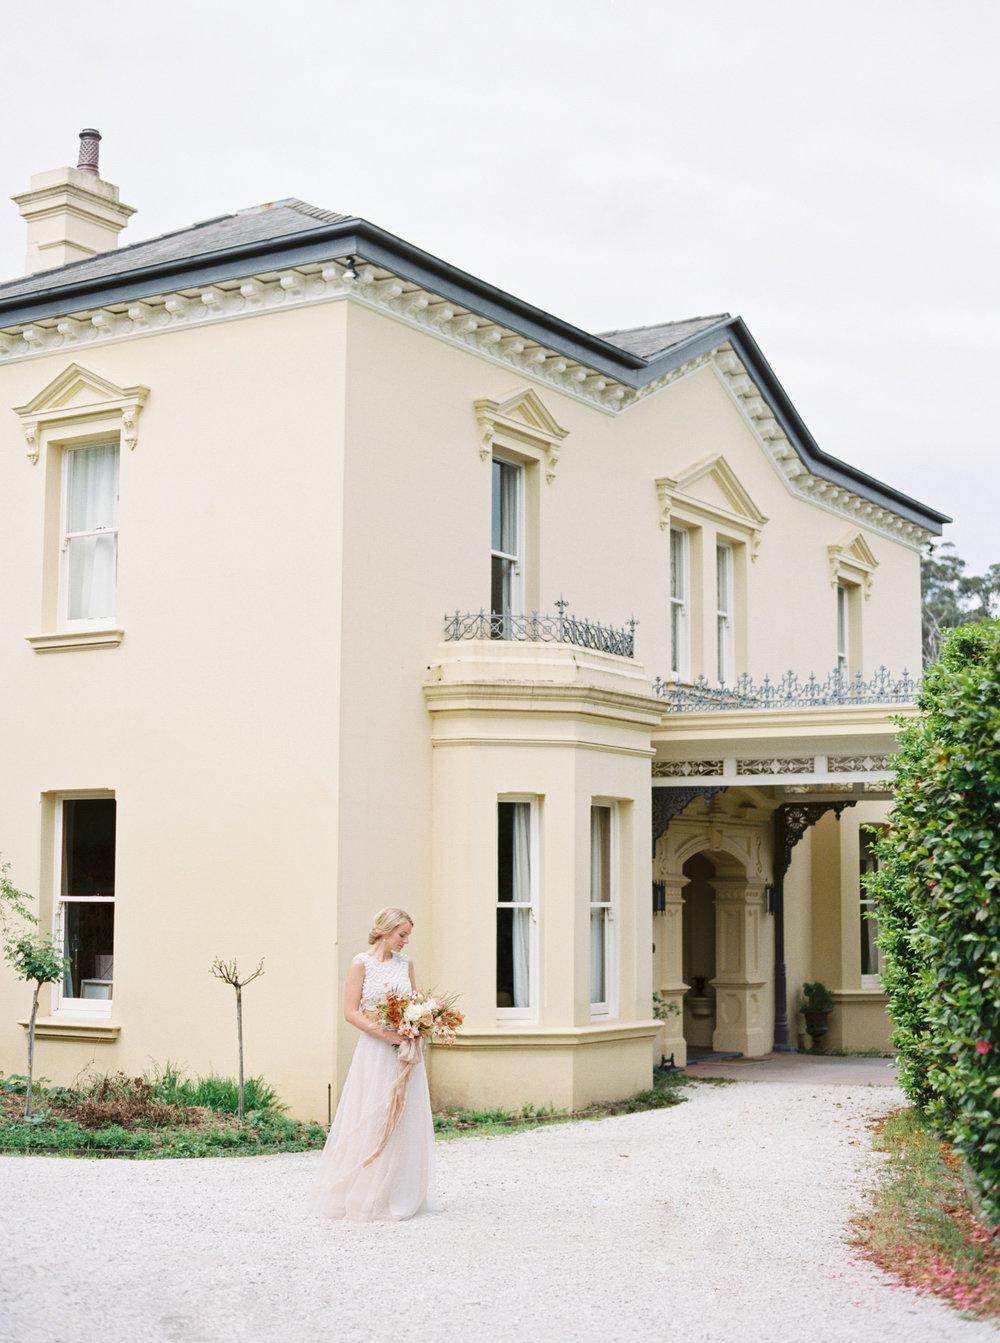 Timeless Southern Highland Wedding Elopement in Bowral NSW Fine Art Film Photographer Sheri McMahon-22.jpg